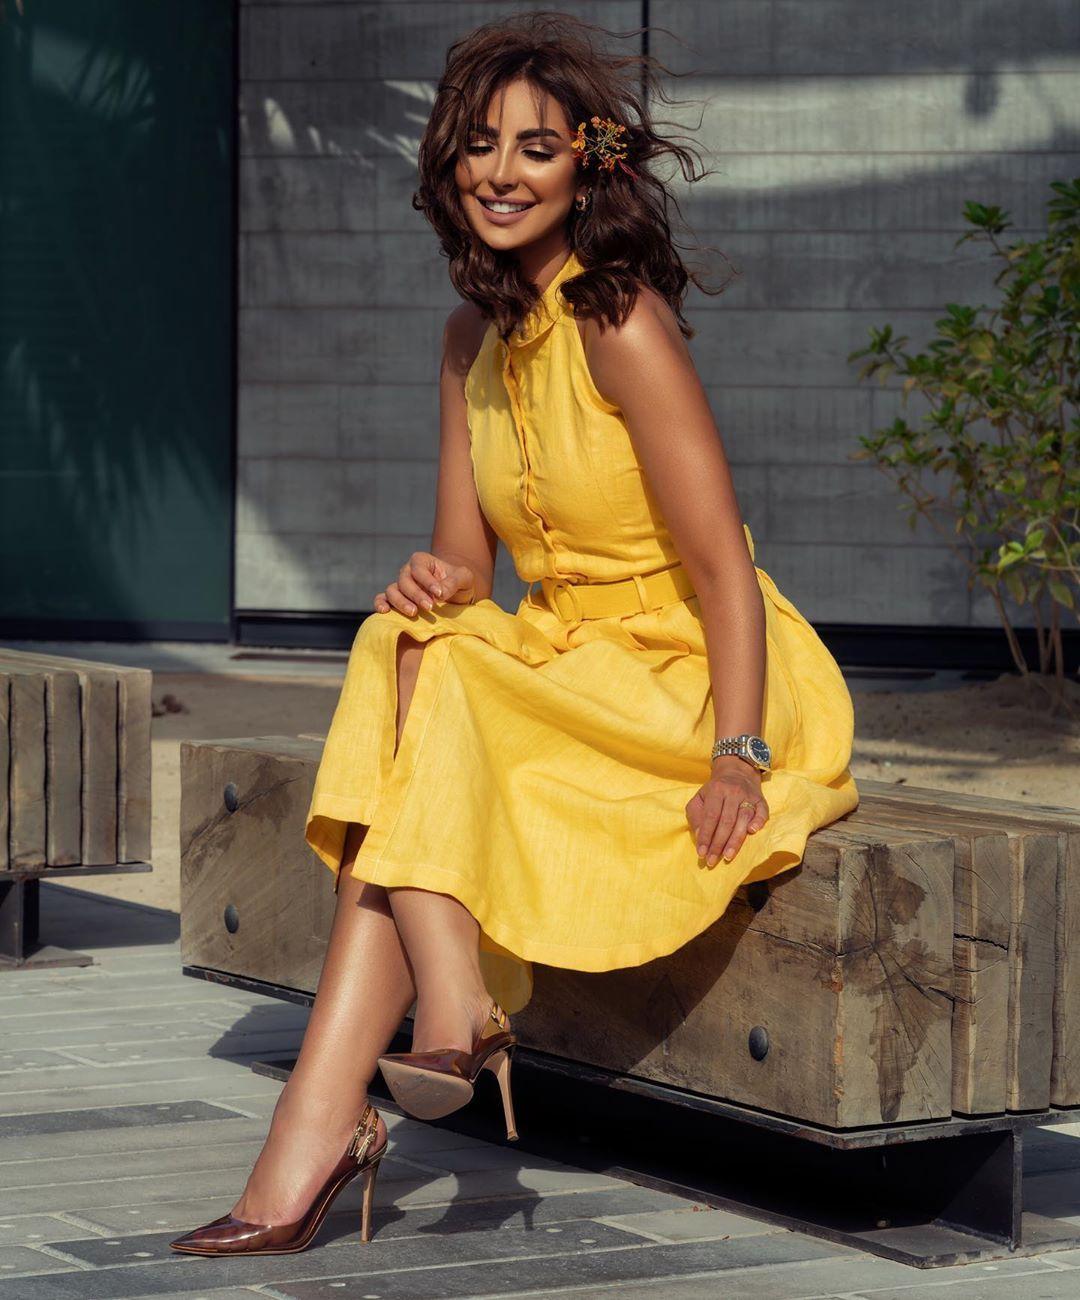 33 6k Likes 871 Comments نـور الـغندور Nour On Instagram ضحـكت يعنـي قلبـها مـال Fashion Fashion Design High Low Dress